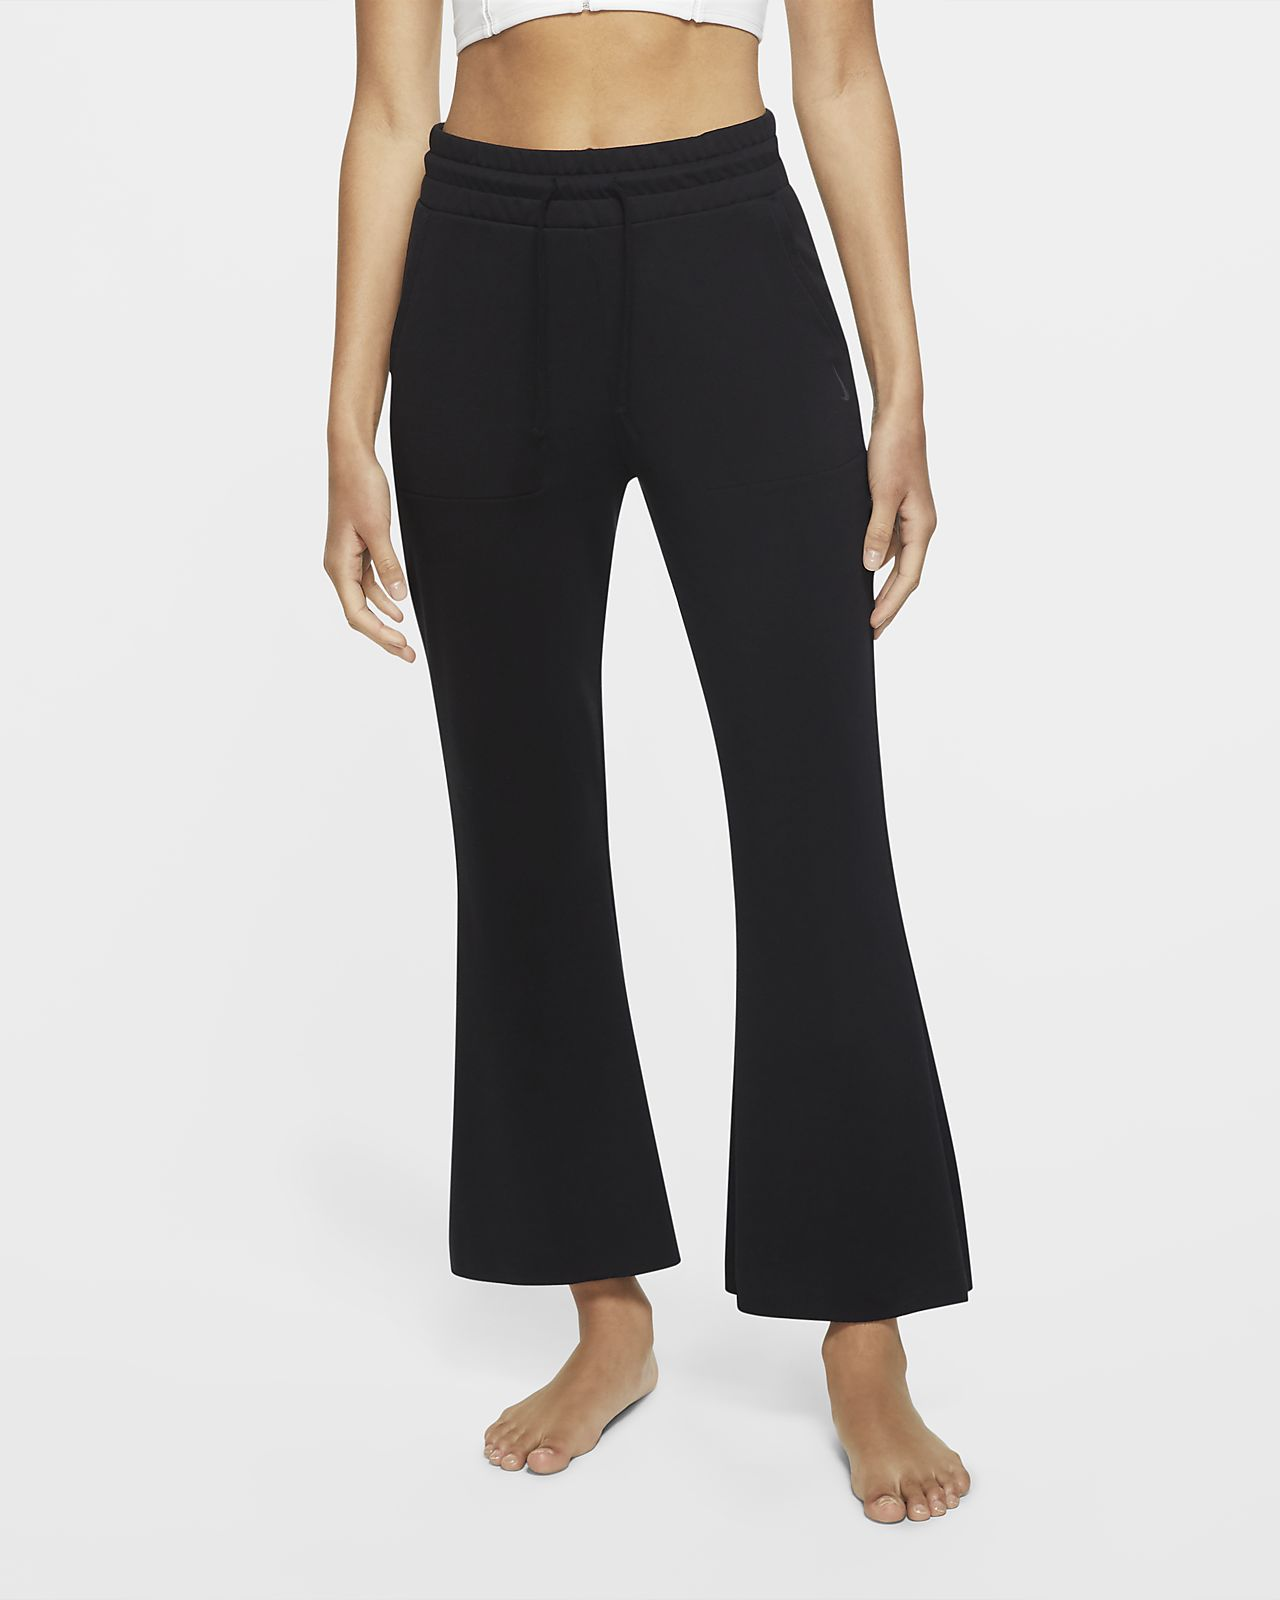 Pantalones de 7/8 para mujer Nike Yoga. Nike.com